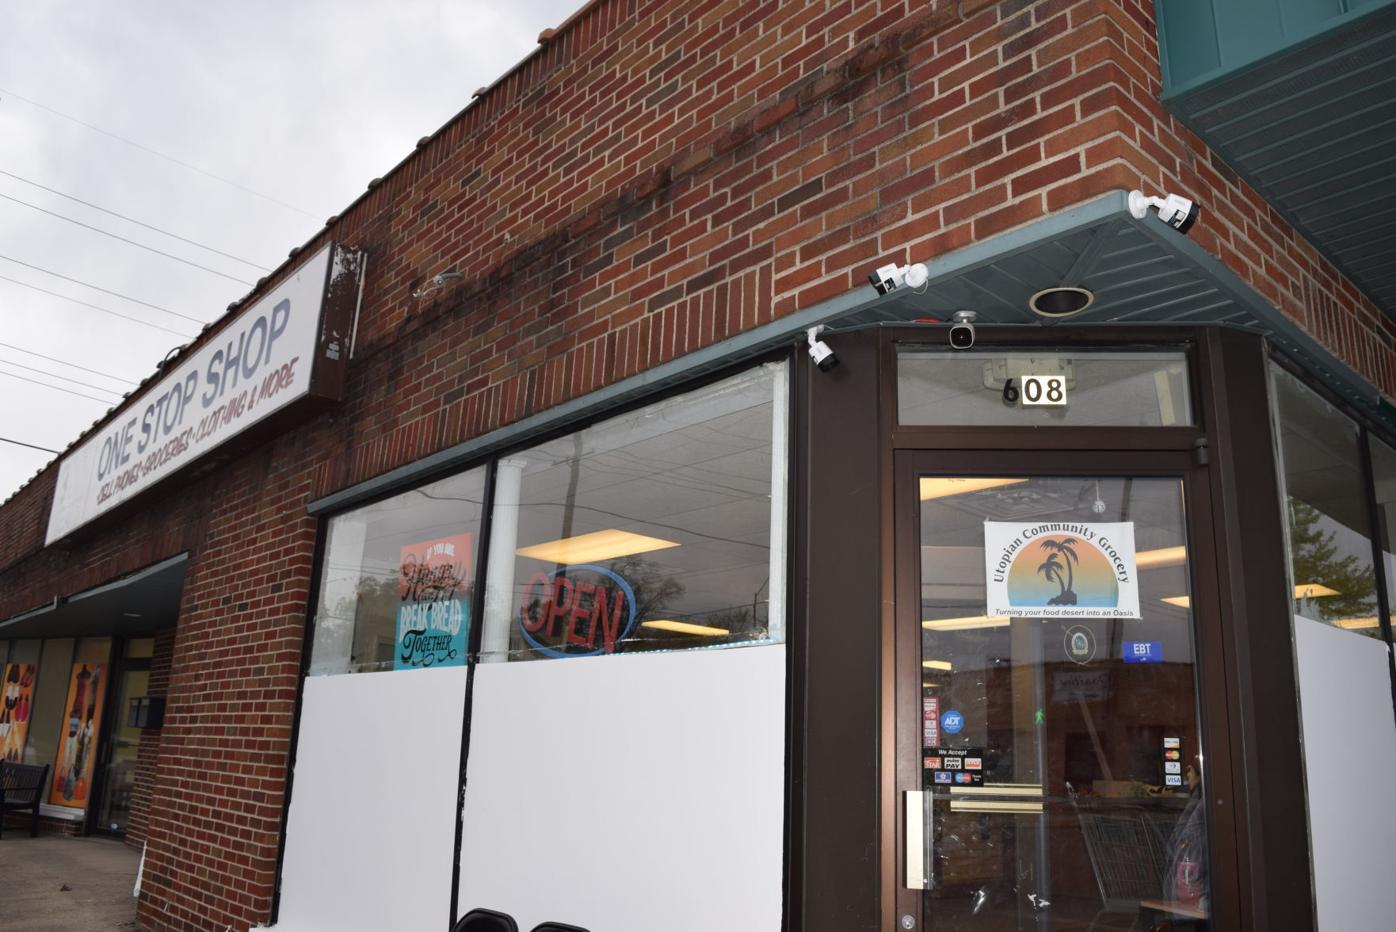 Utopian Community Grocery Store - 608 Oxford Street